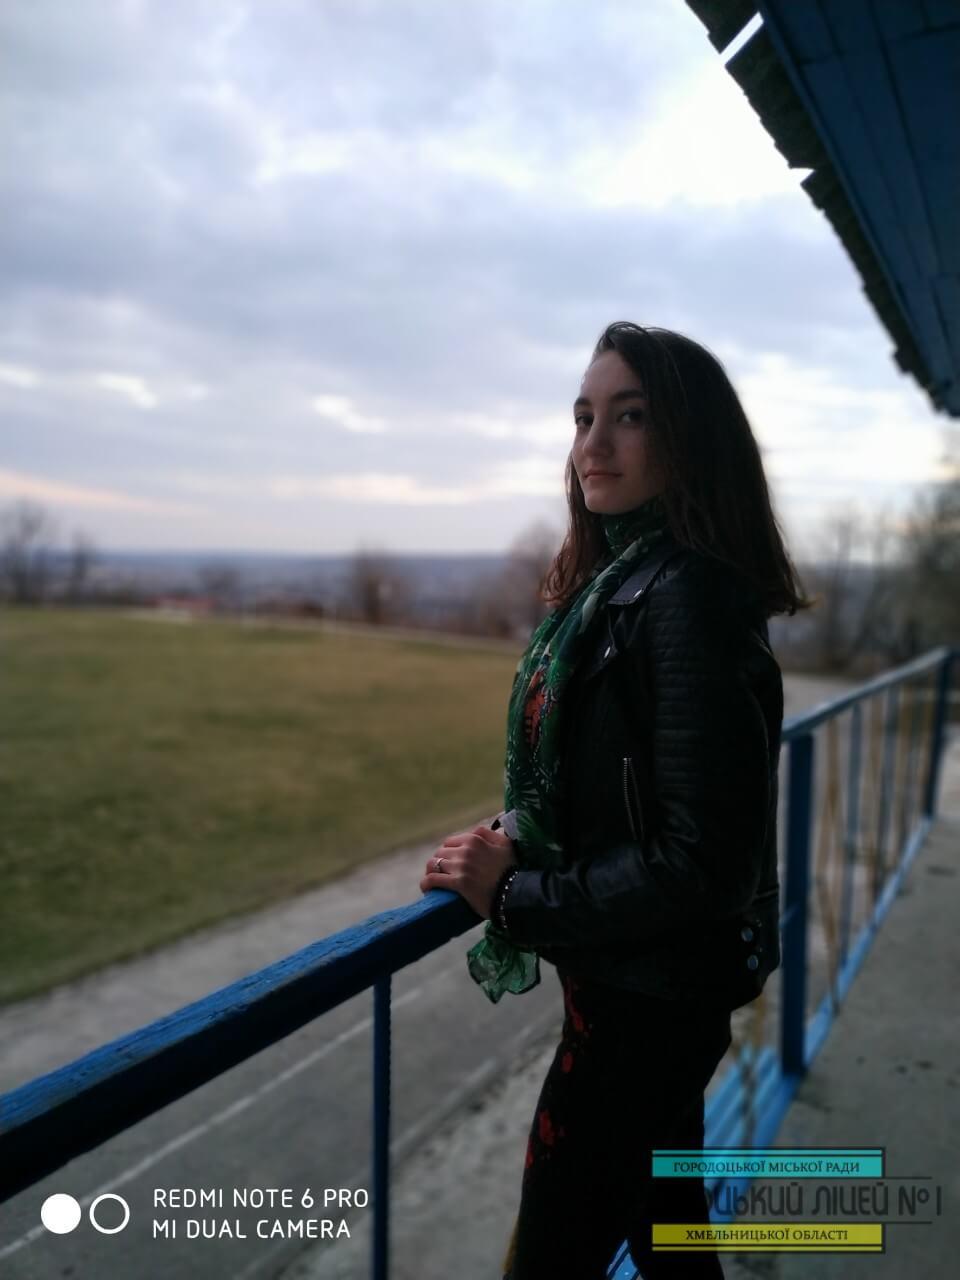 zobrazhennya viber 2019 05 16 09 47 32 - Швидше, вище, сильніше!